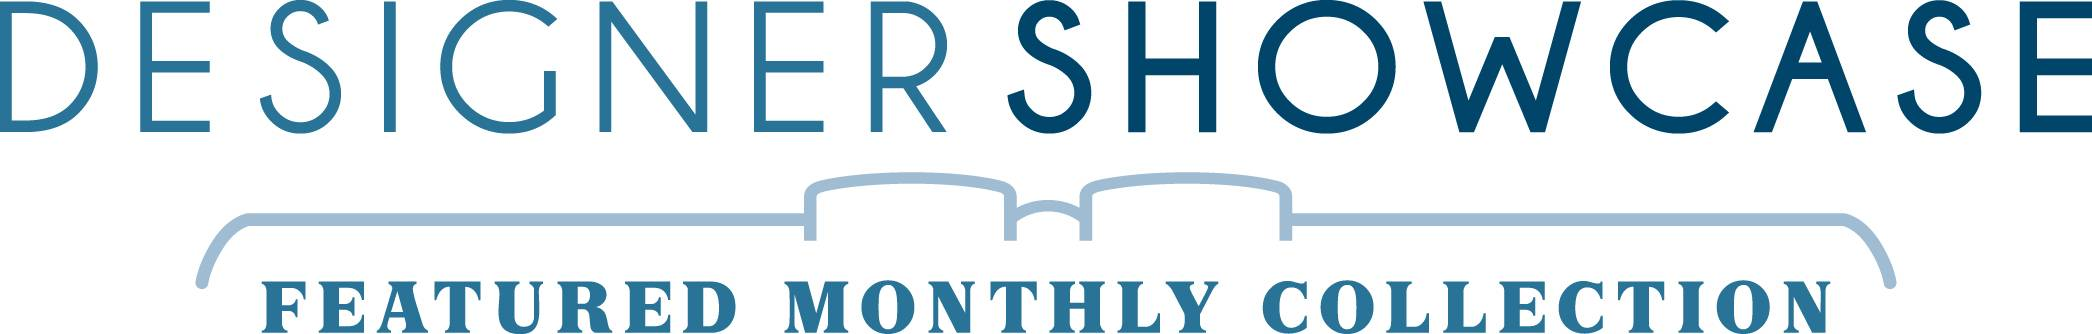 designer showcase logo HIGH